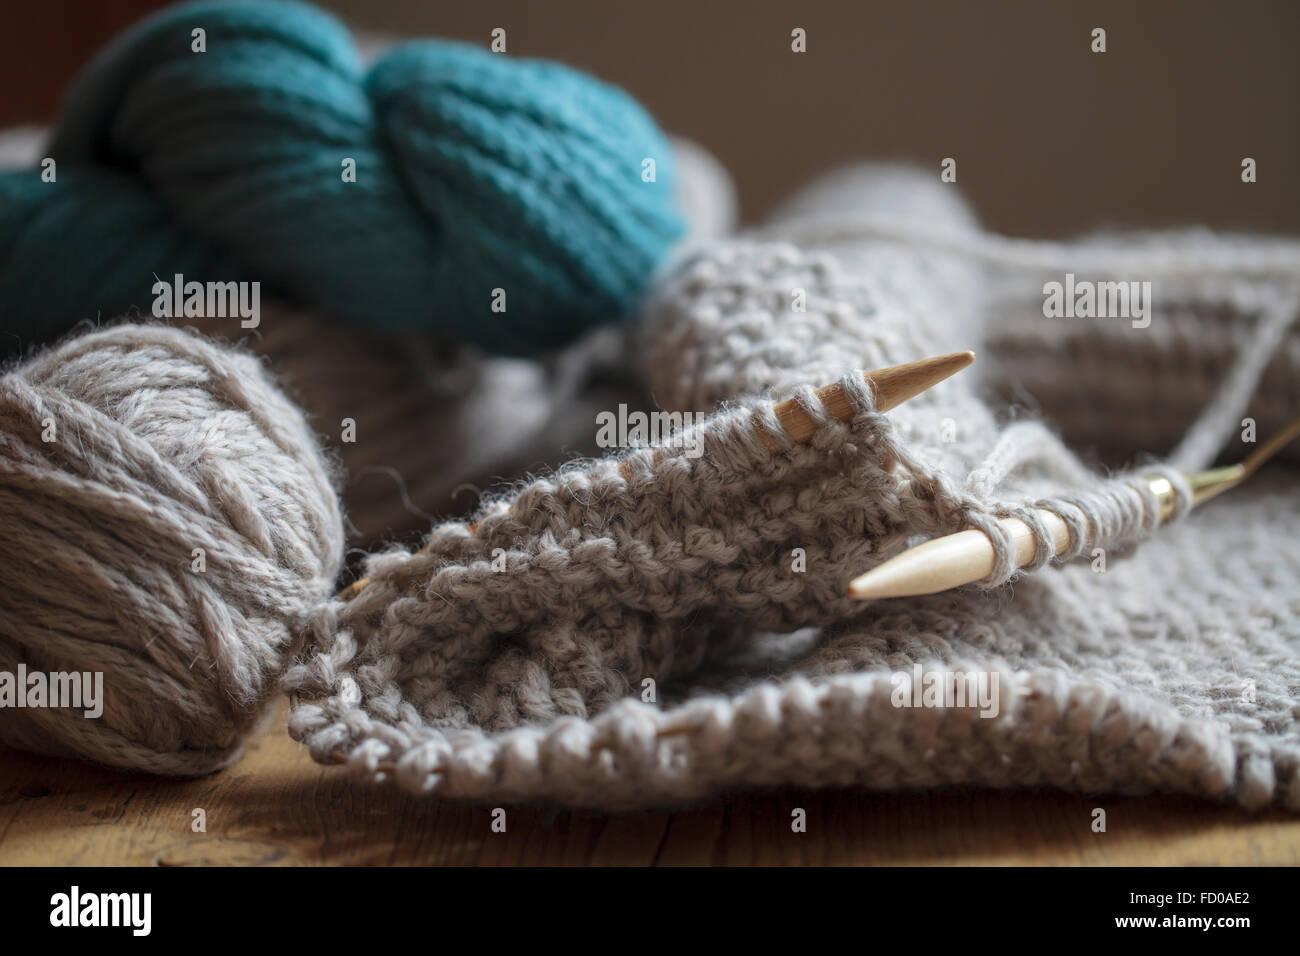 Knitting needles and wool - Stock Image